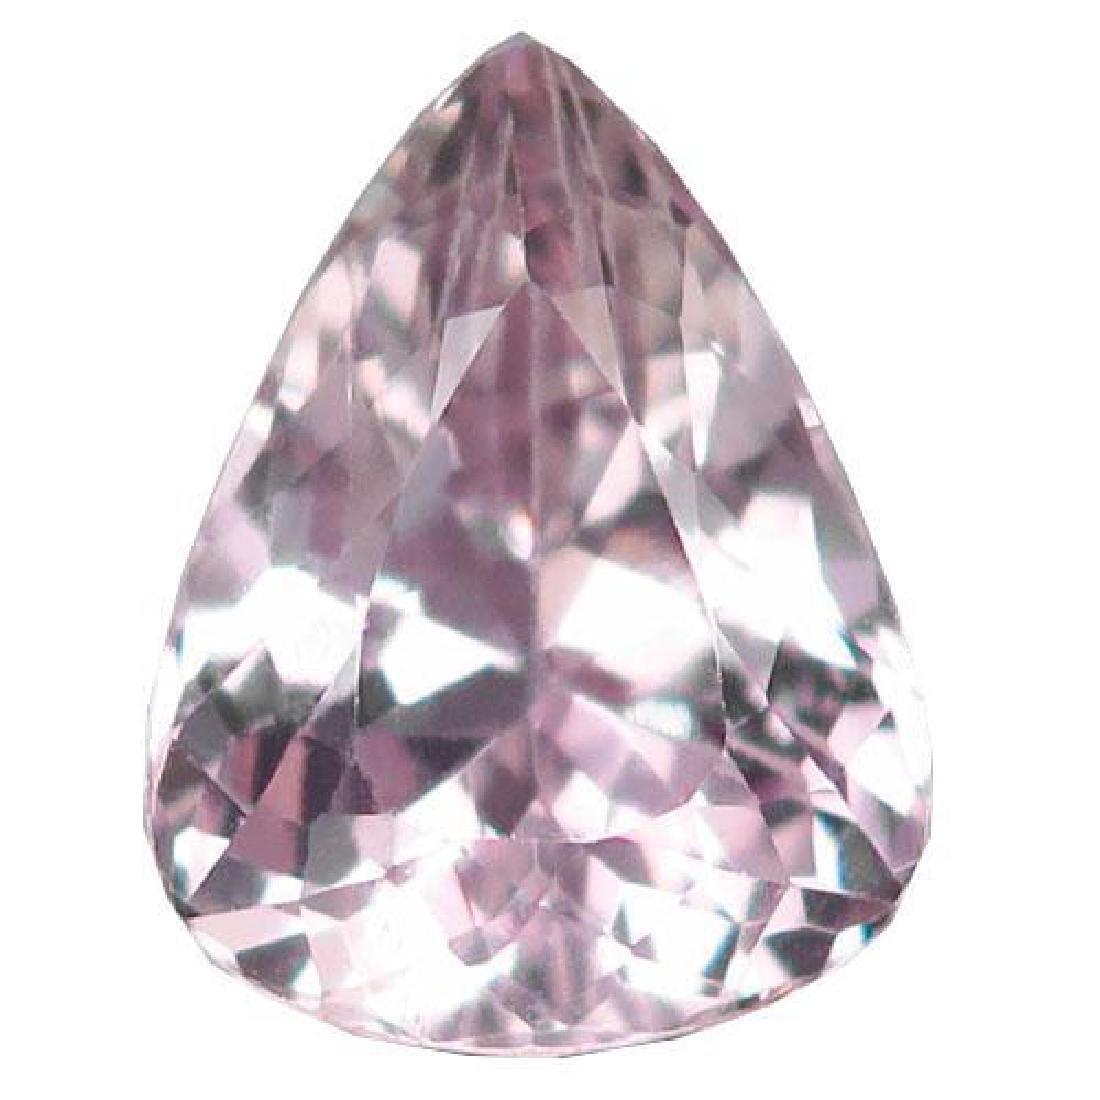 5.17ct Natural Silver Pink Brazilian Pear Cut Kunzite